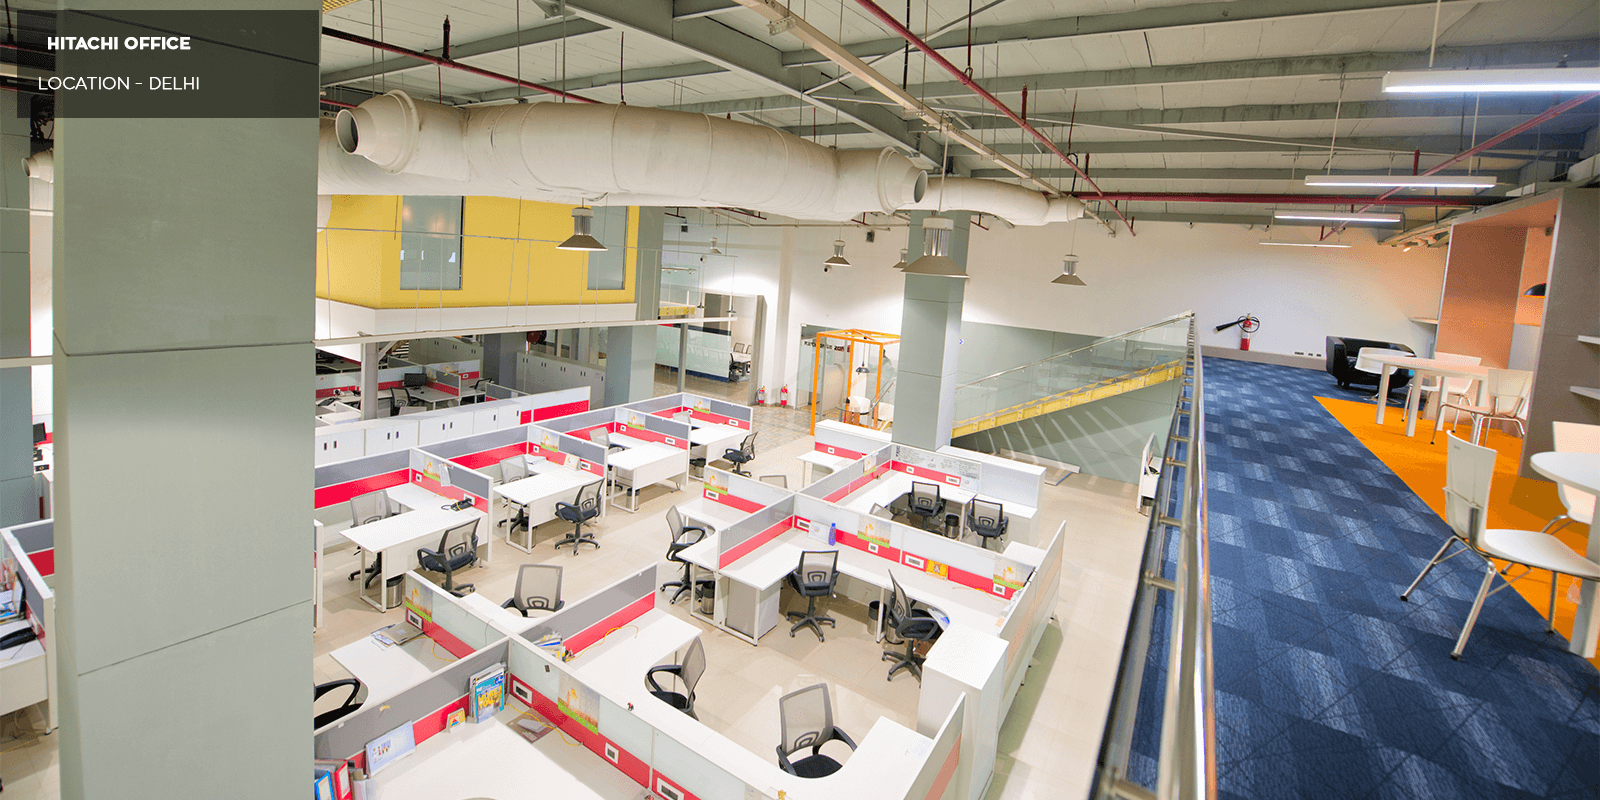 hitachi4-the-novarch-architects-best-architects-in-cr-park-south-delhi-110019